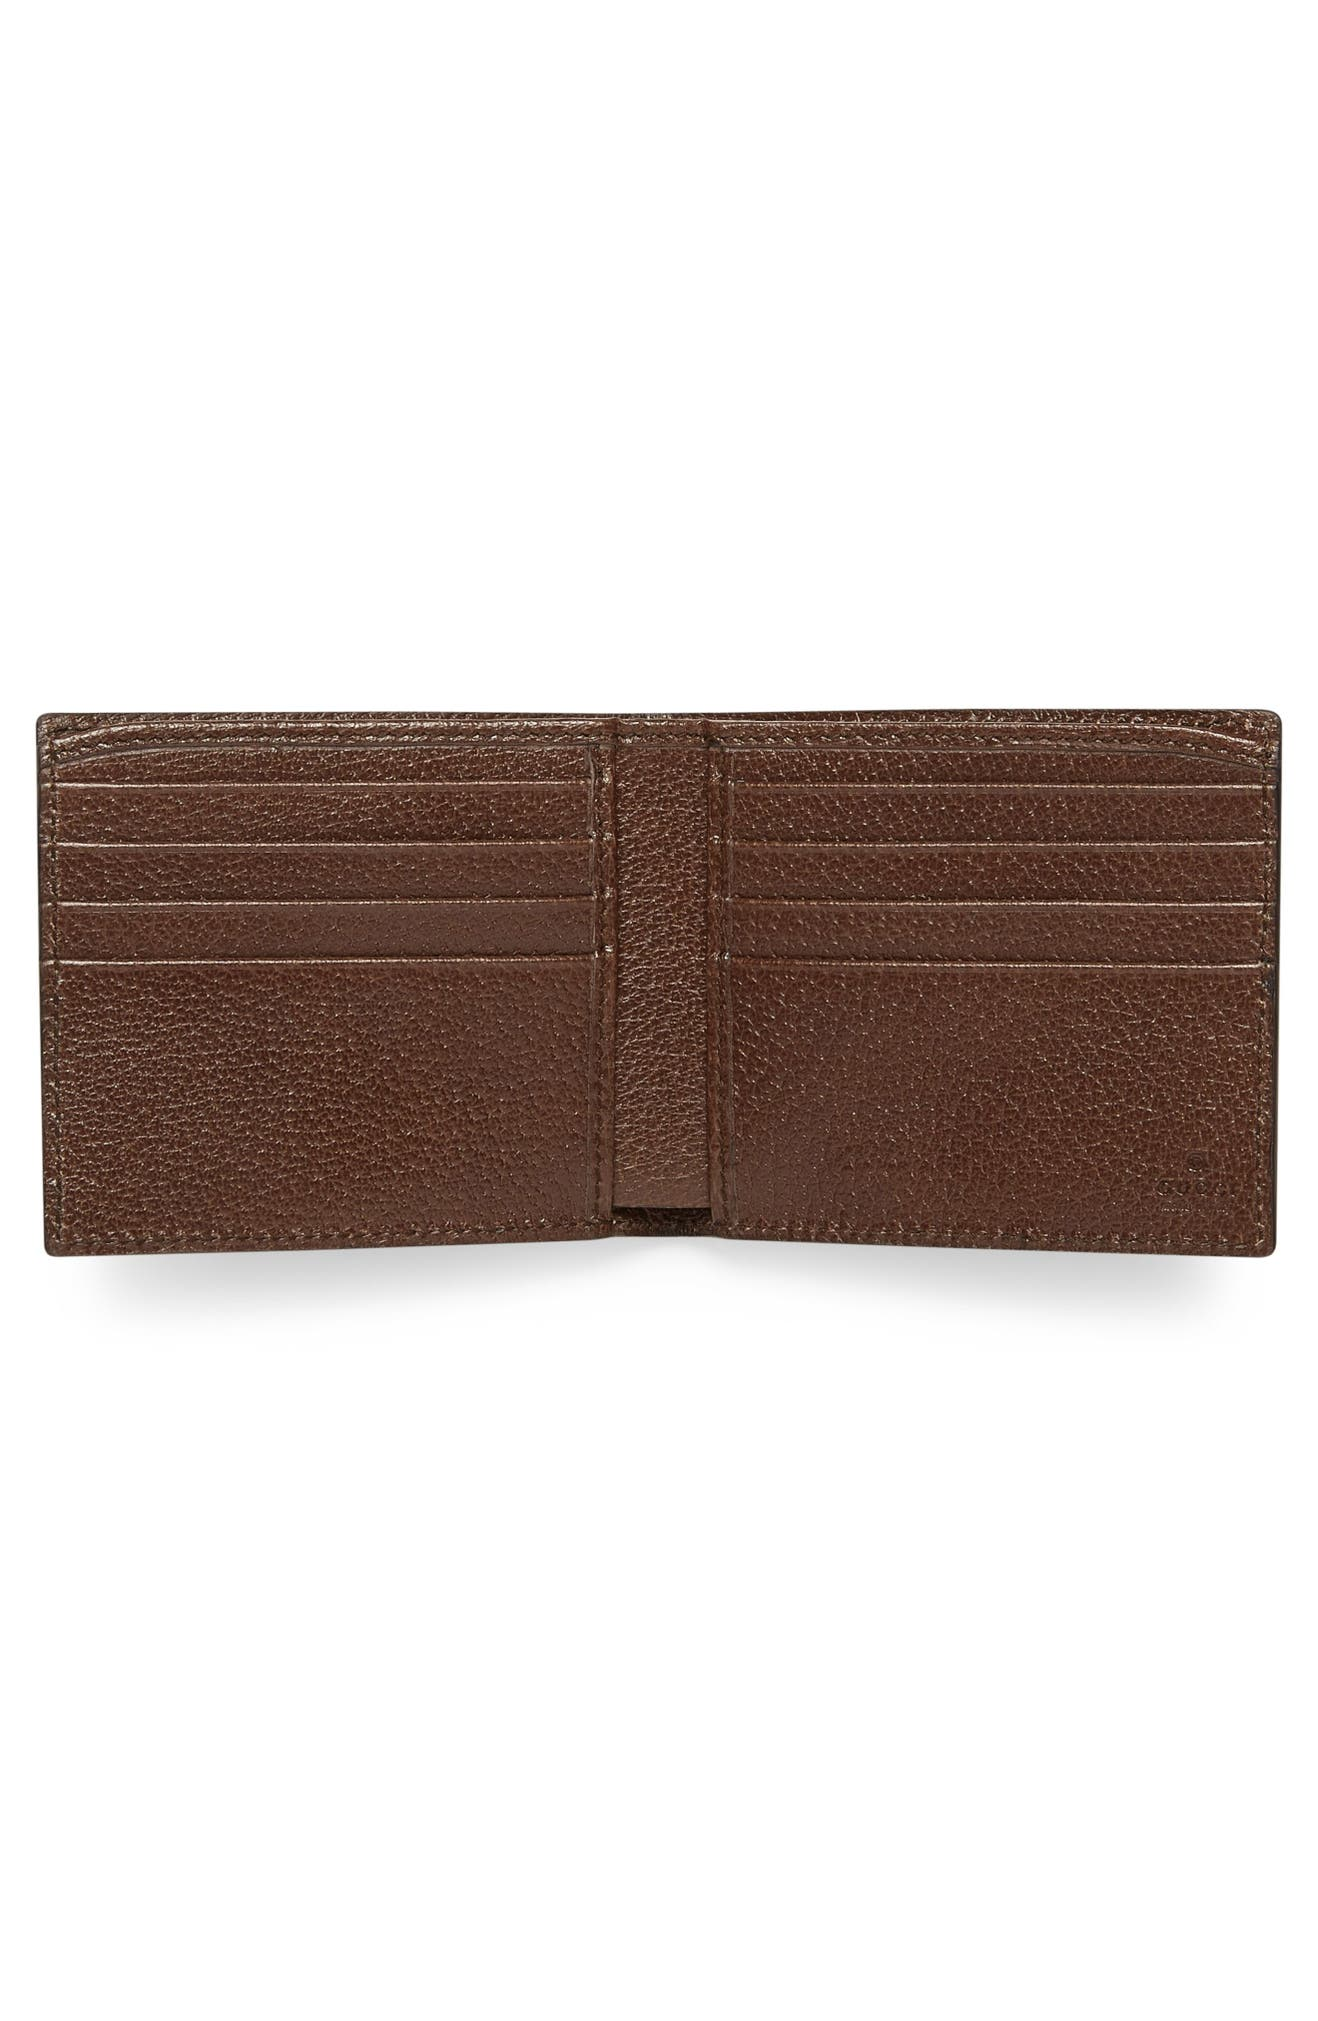 194477815b1a63 Gucci Bird Wallet | Nordstrom